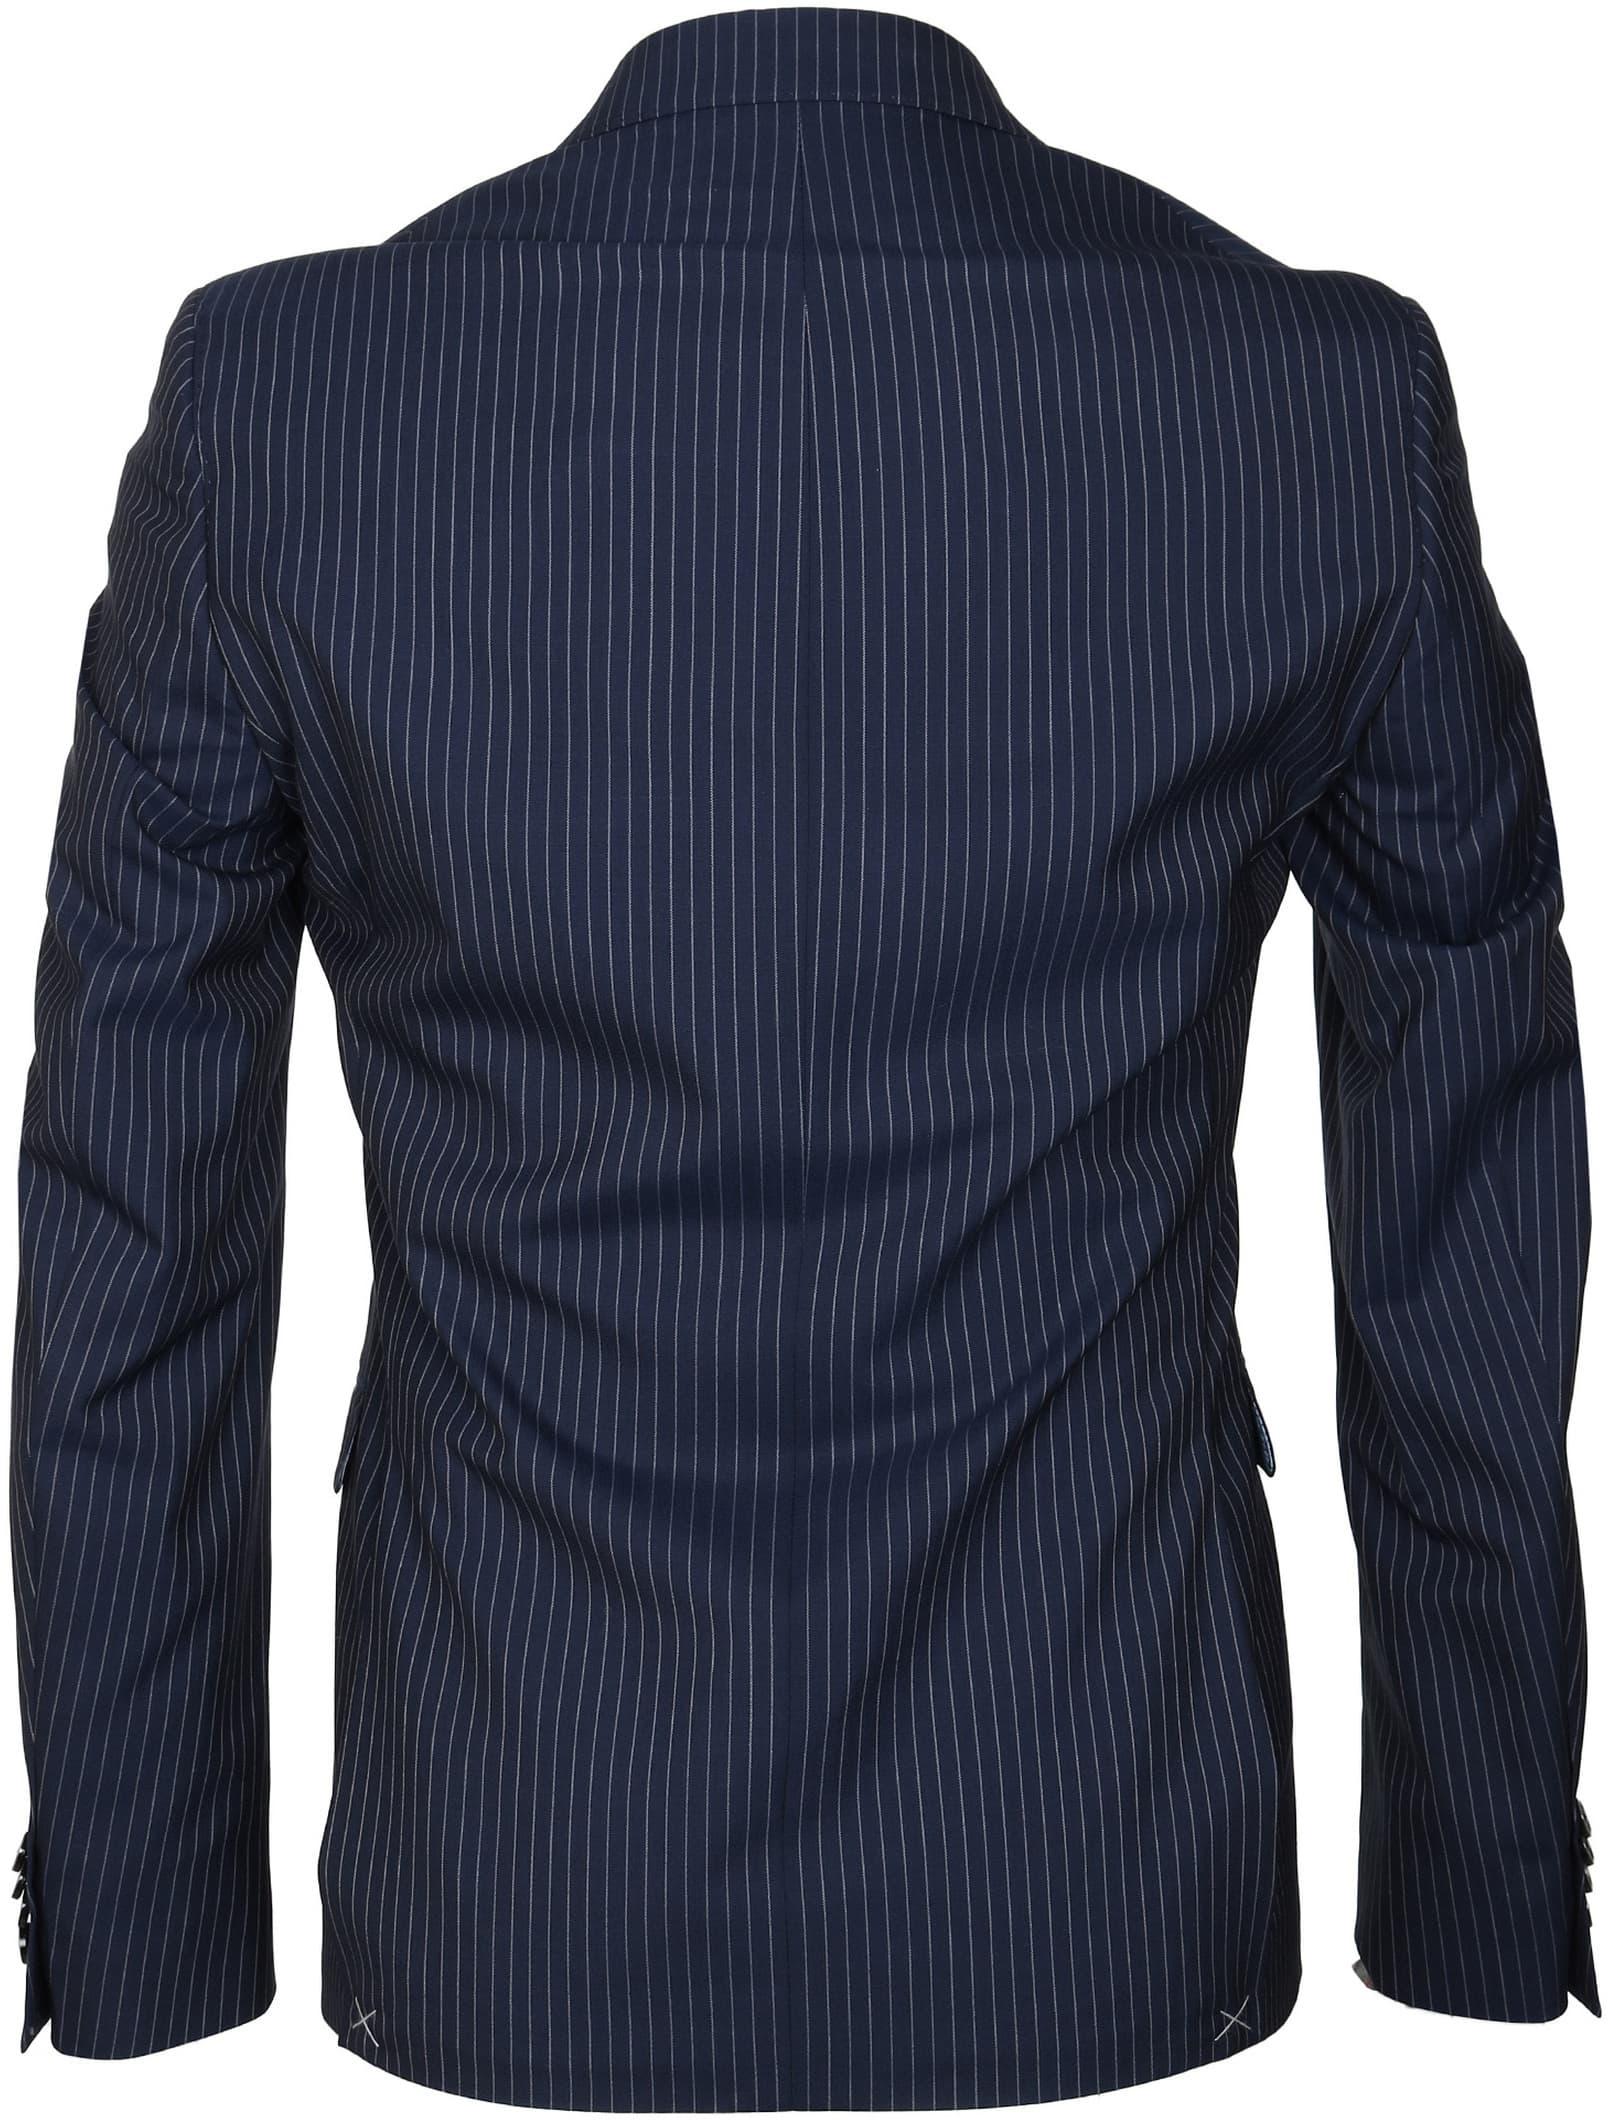 Suitable Anzug Strato Streifen Dunkelblau foto 4